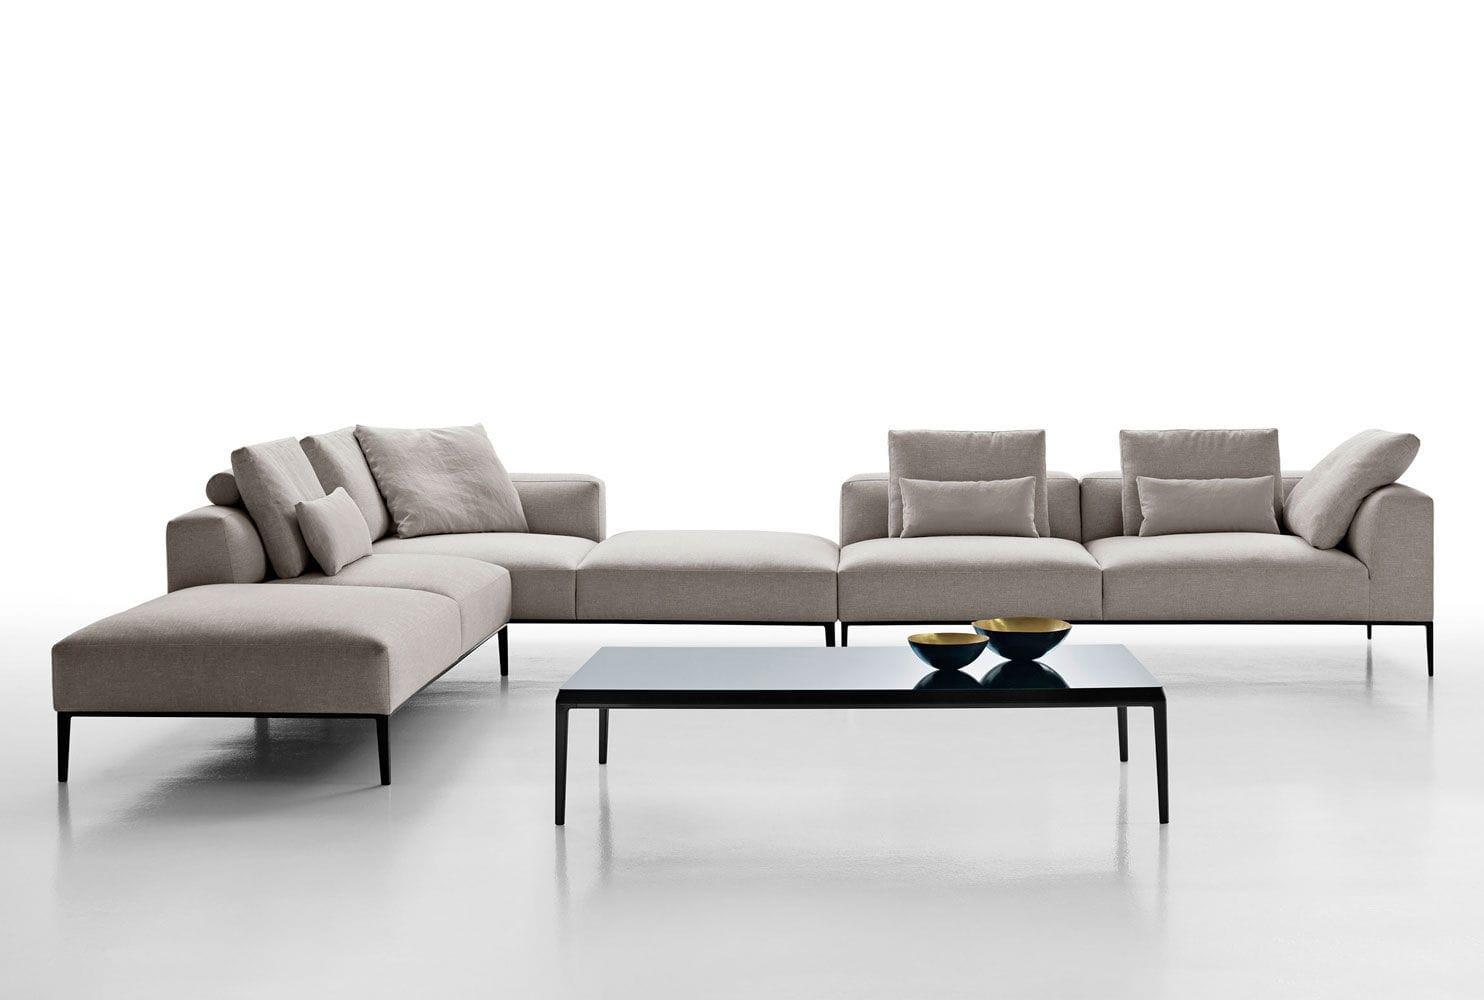 Modular Sofa Contemporary Leather Fabric Michel Effe